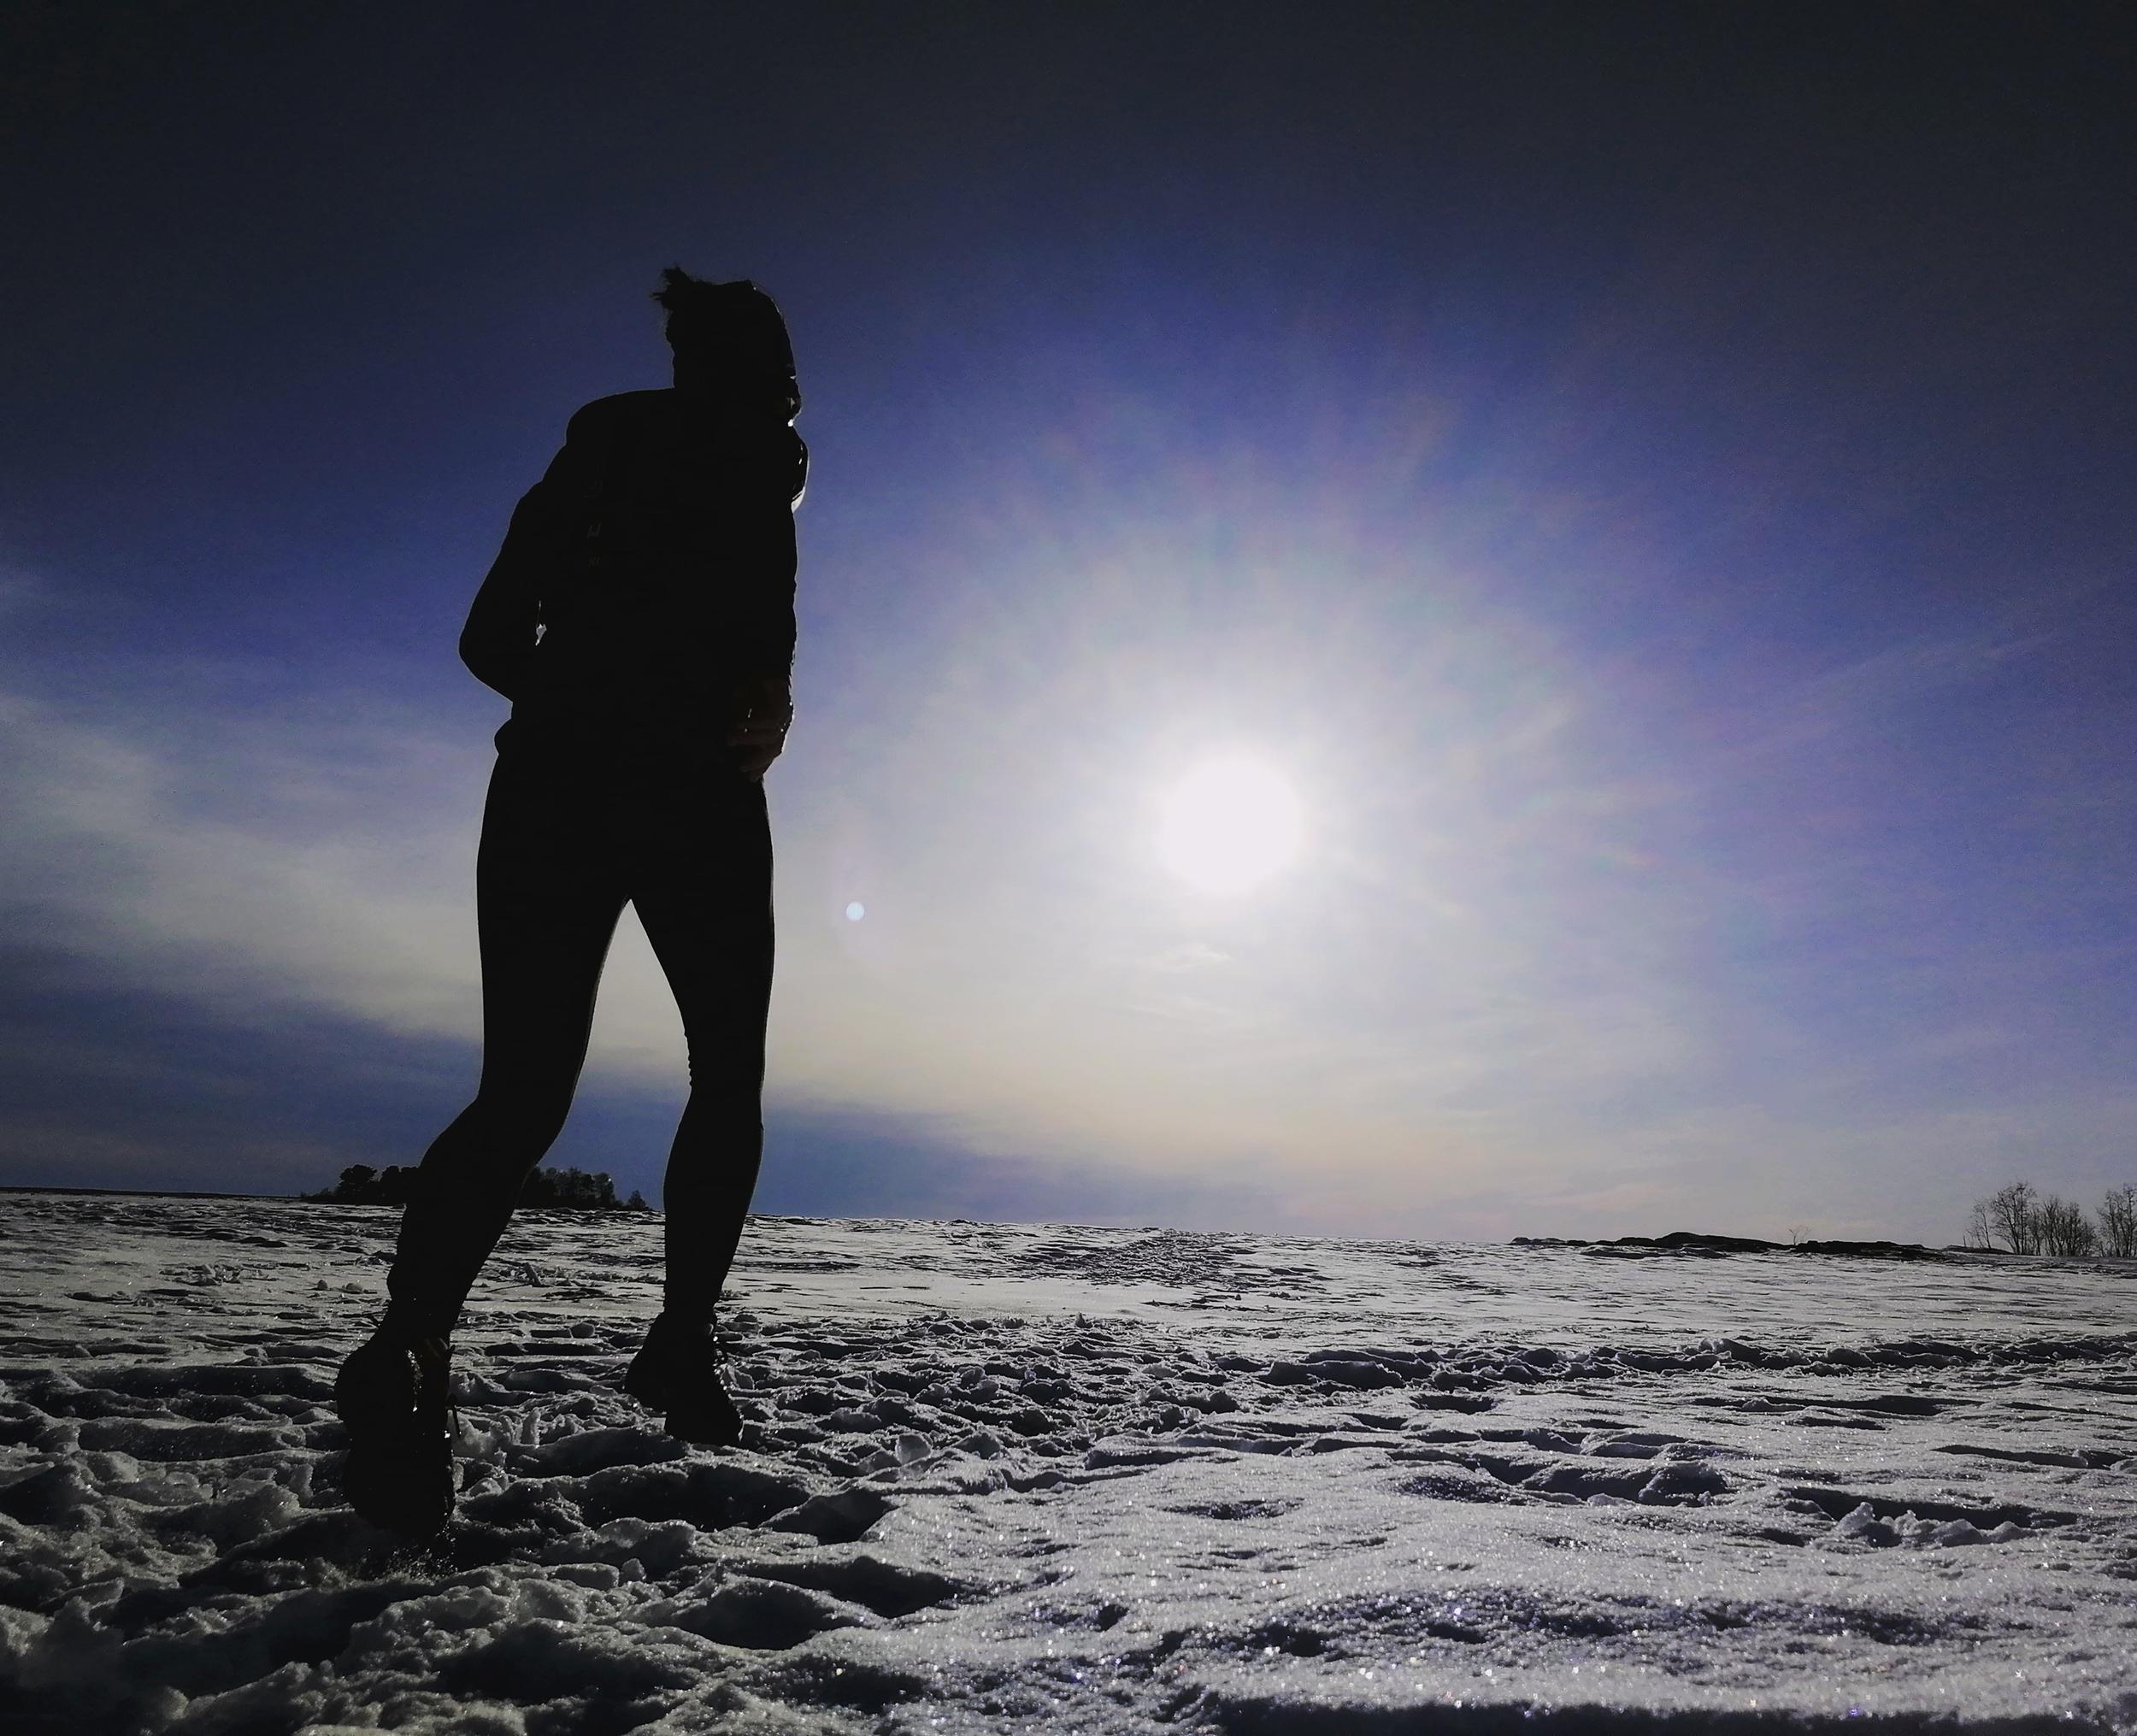 Balanserat-trail-running-01.jpg